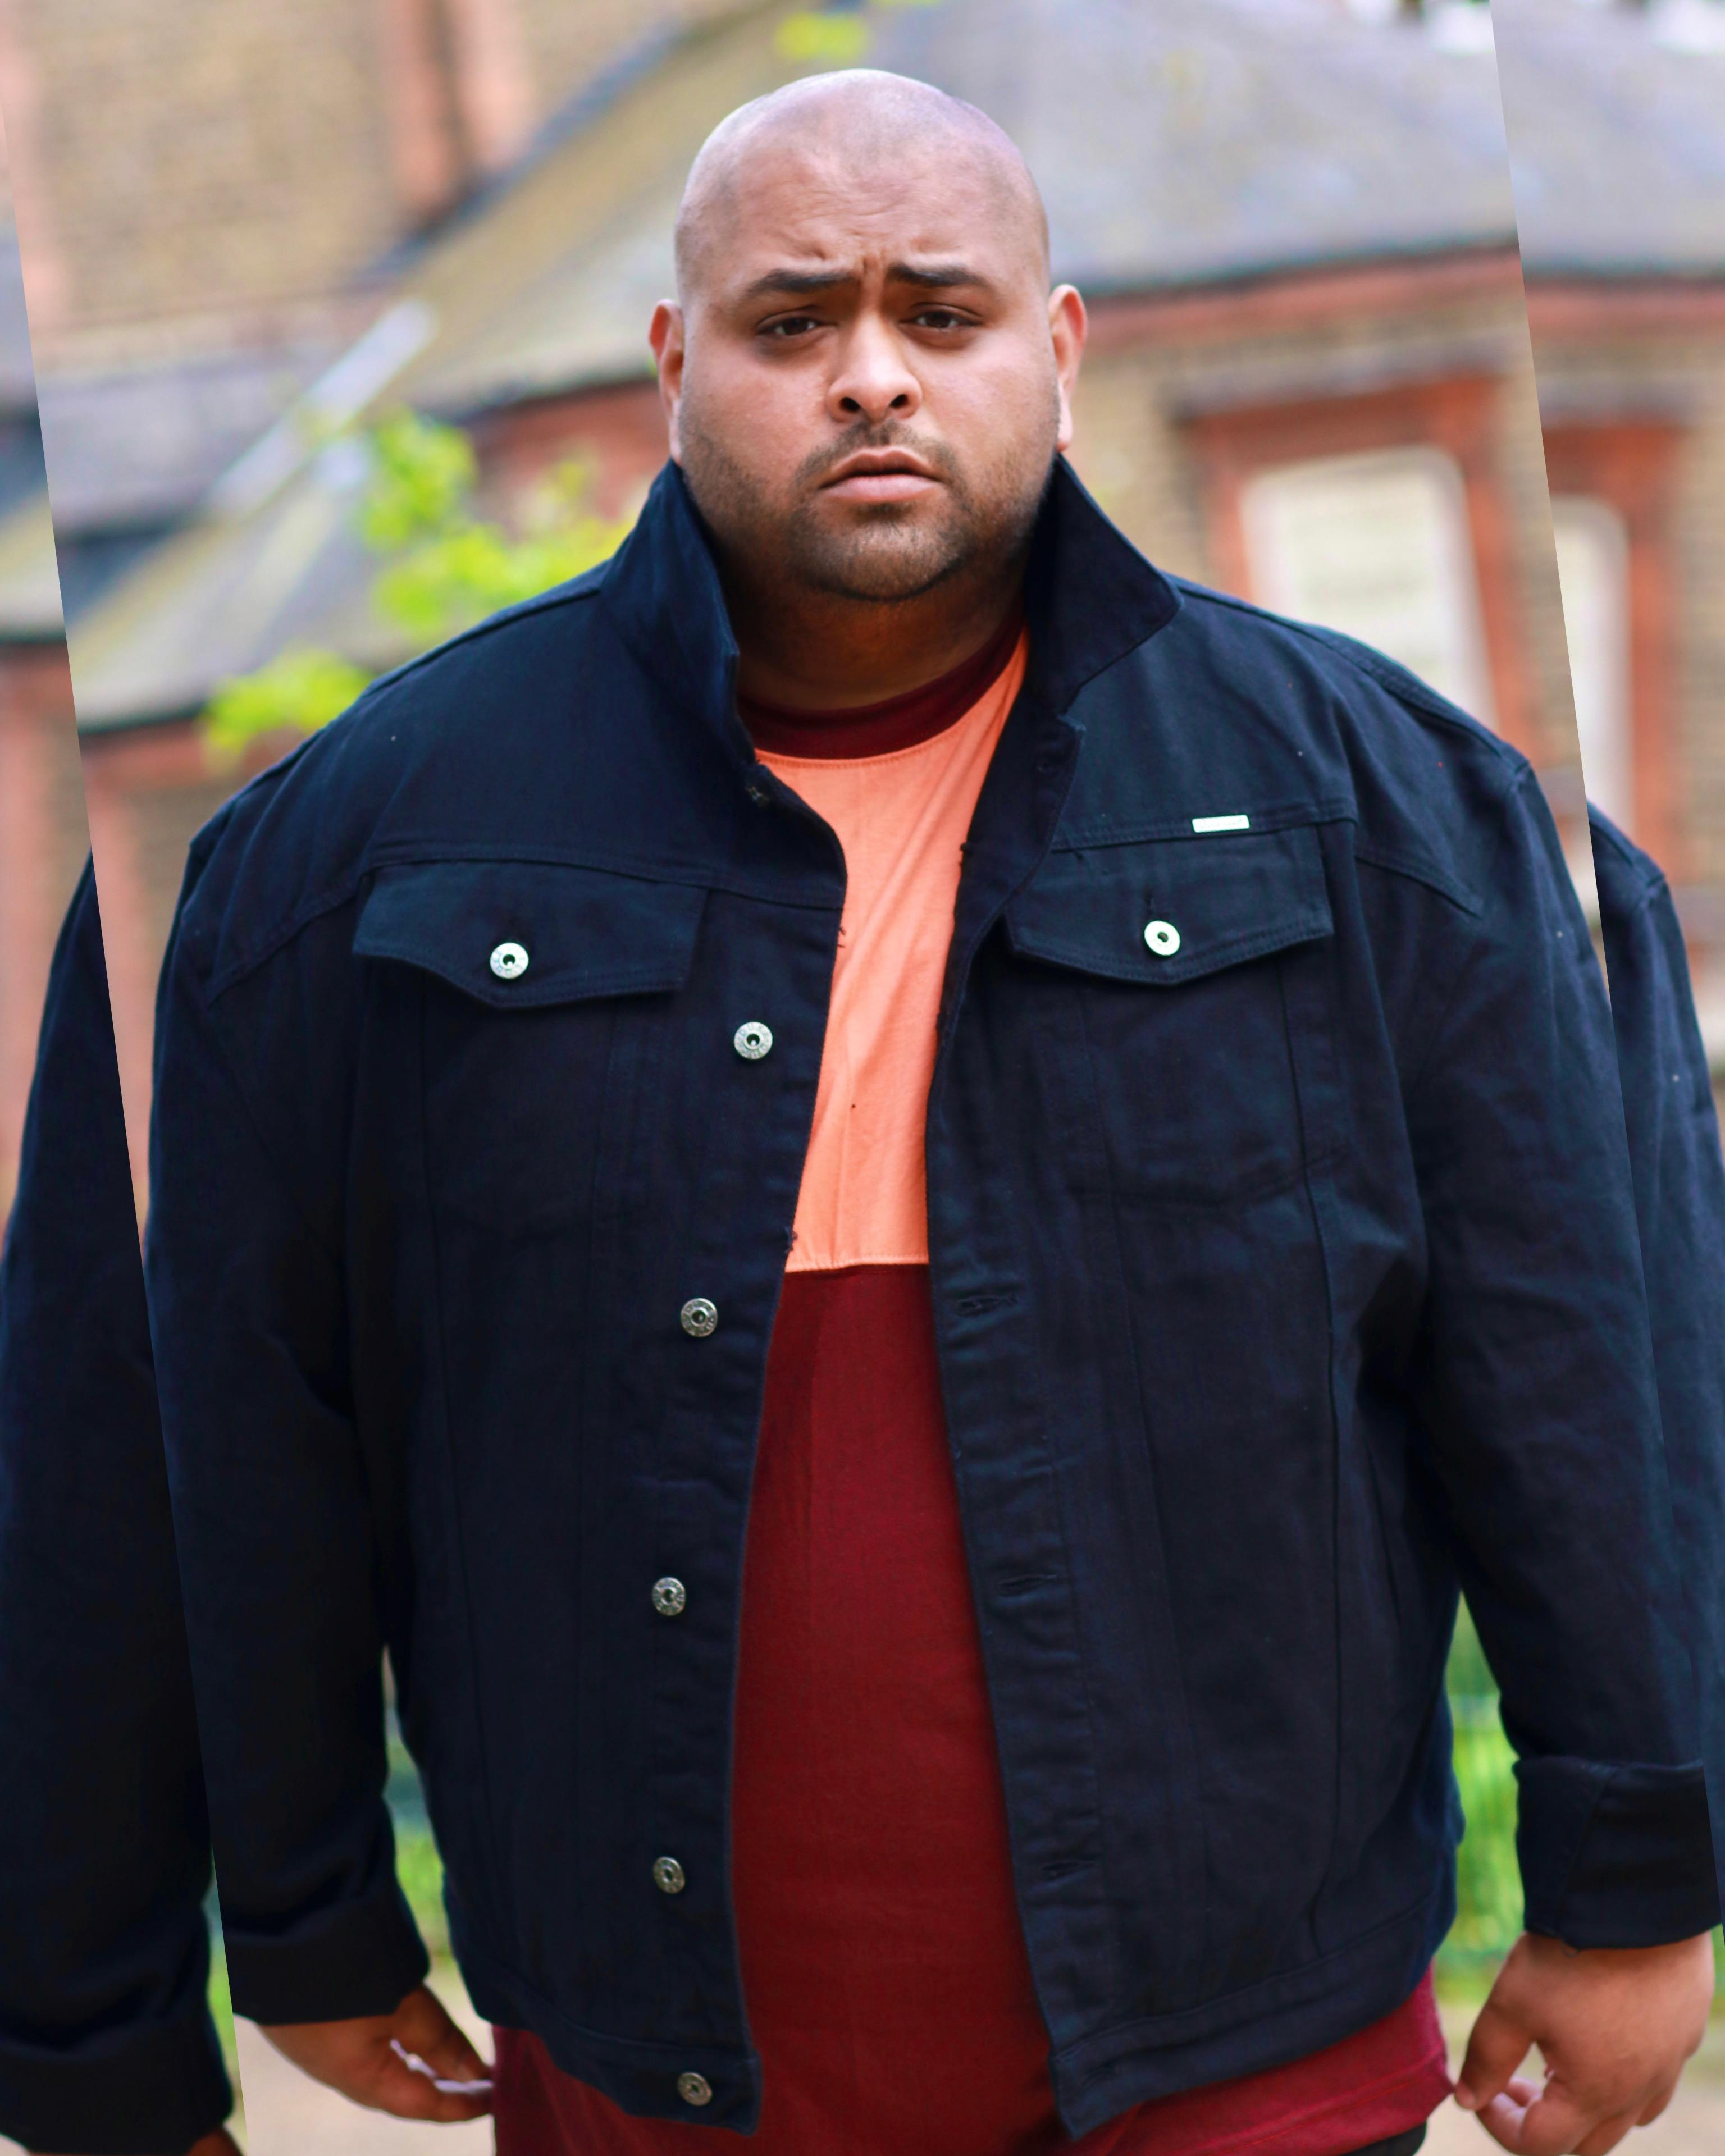 Influencer Sugapuff wearing a black denim jacket and red and orange t-shirt